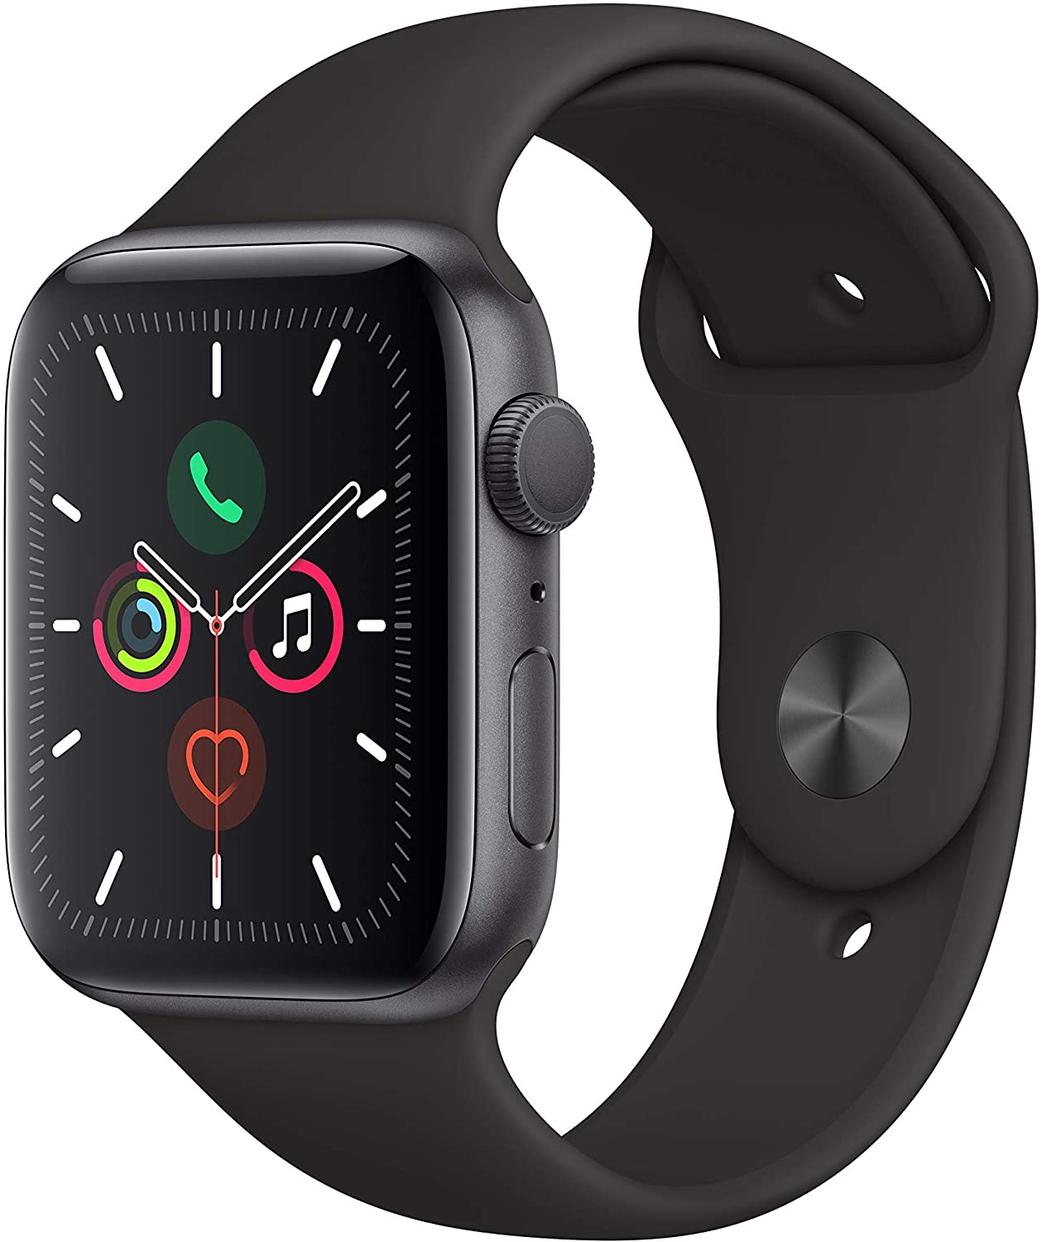 Apple(アップル) Apple Watch Series5(GPSモデル) MWVF2J/Aの商品画像